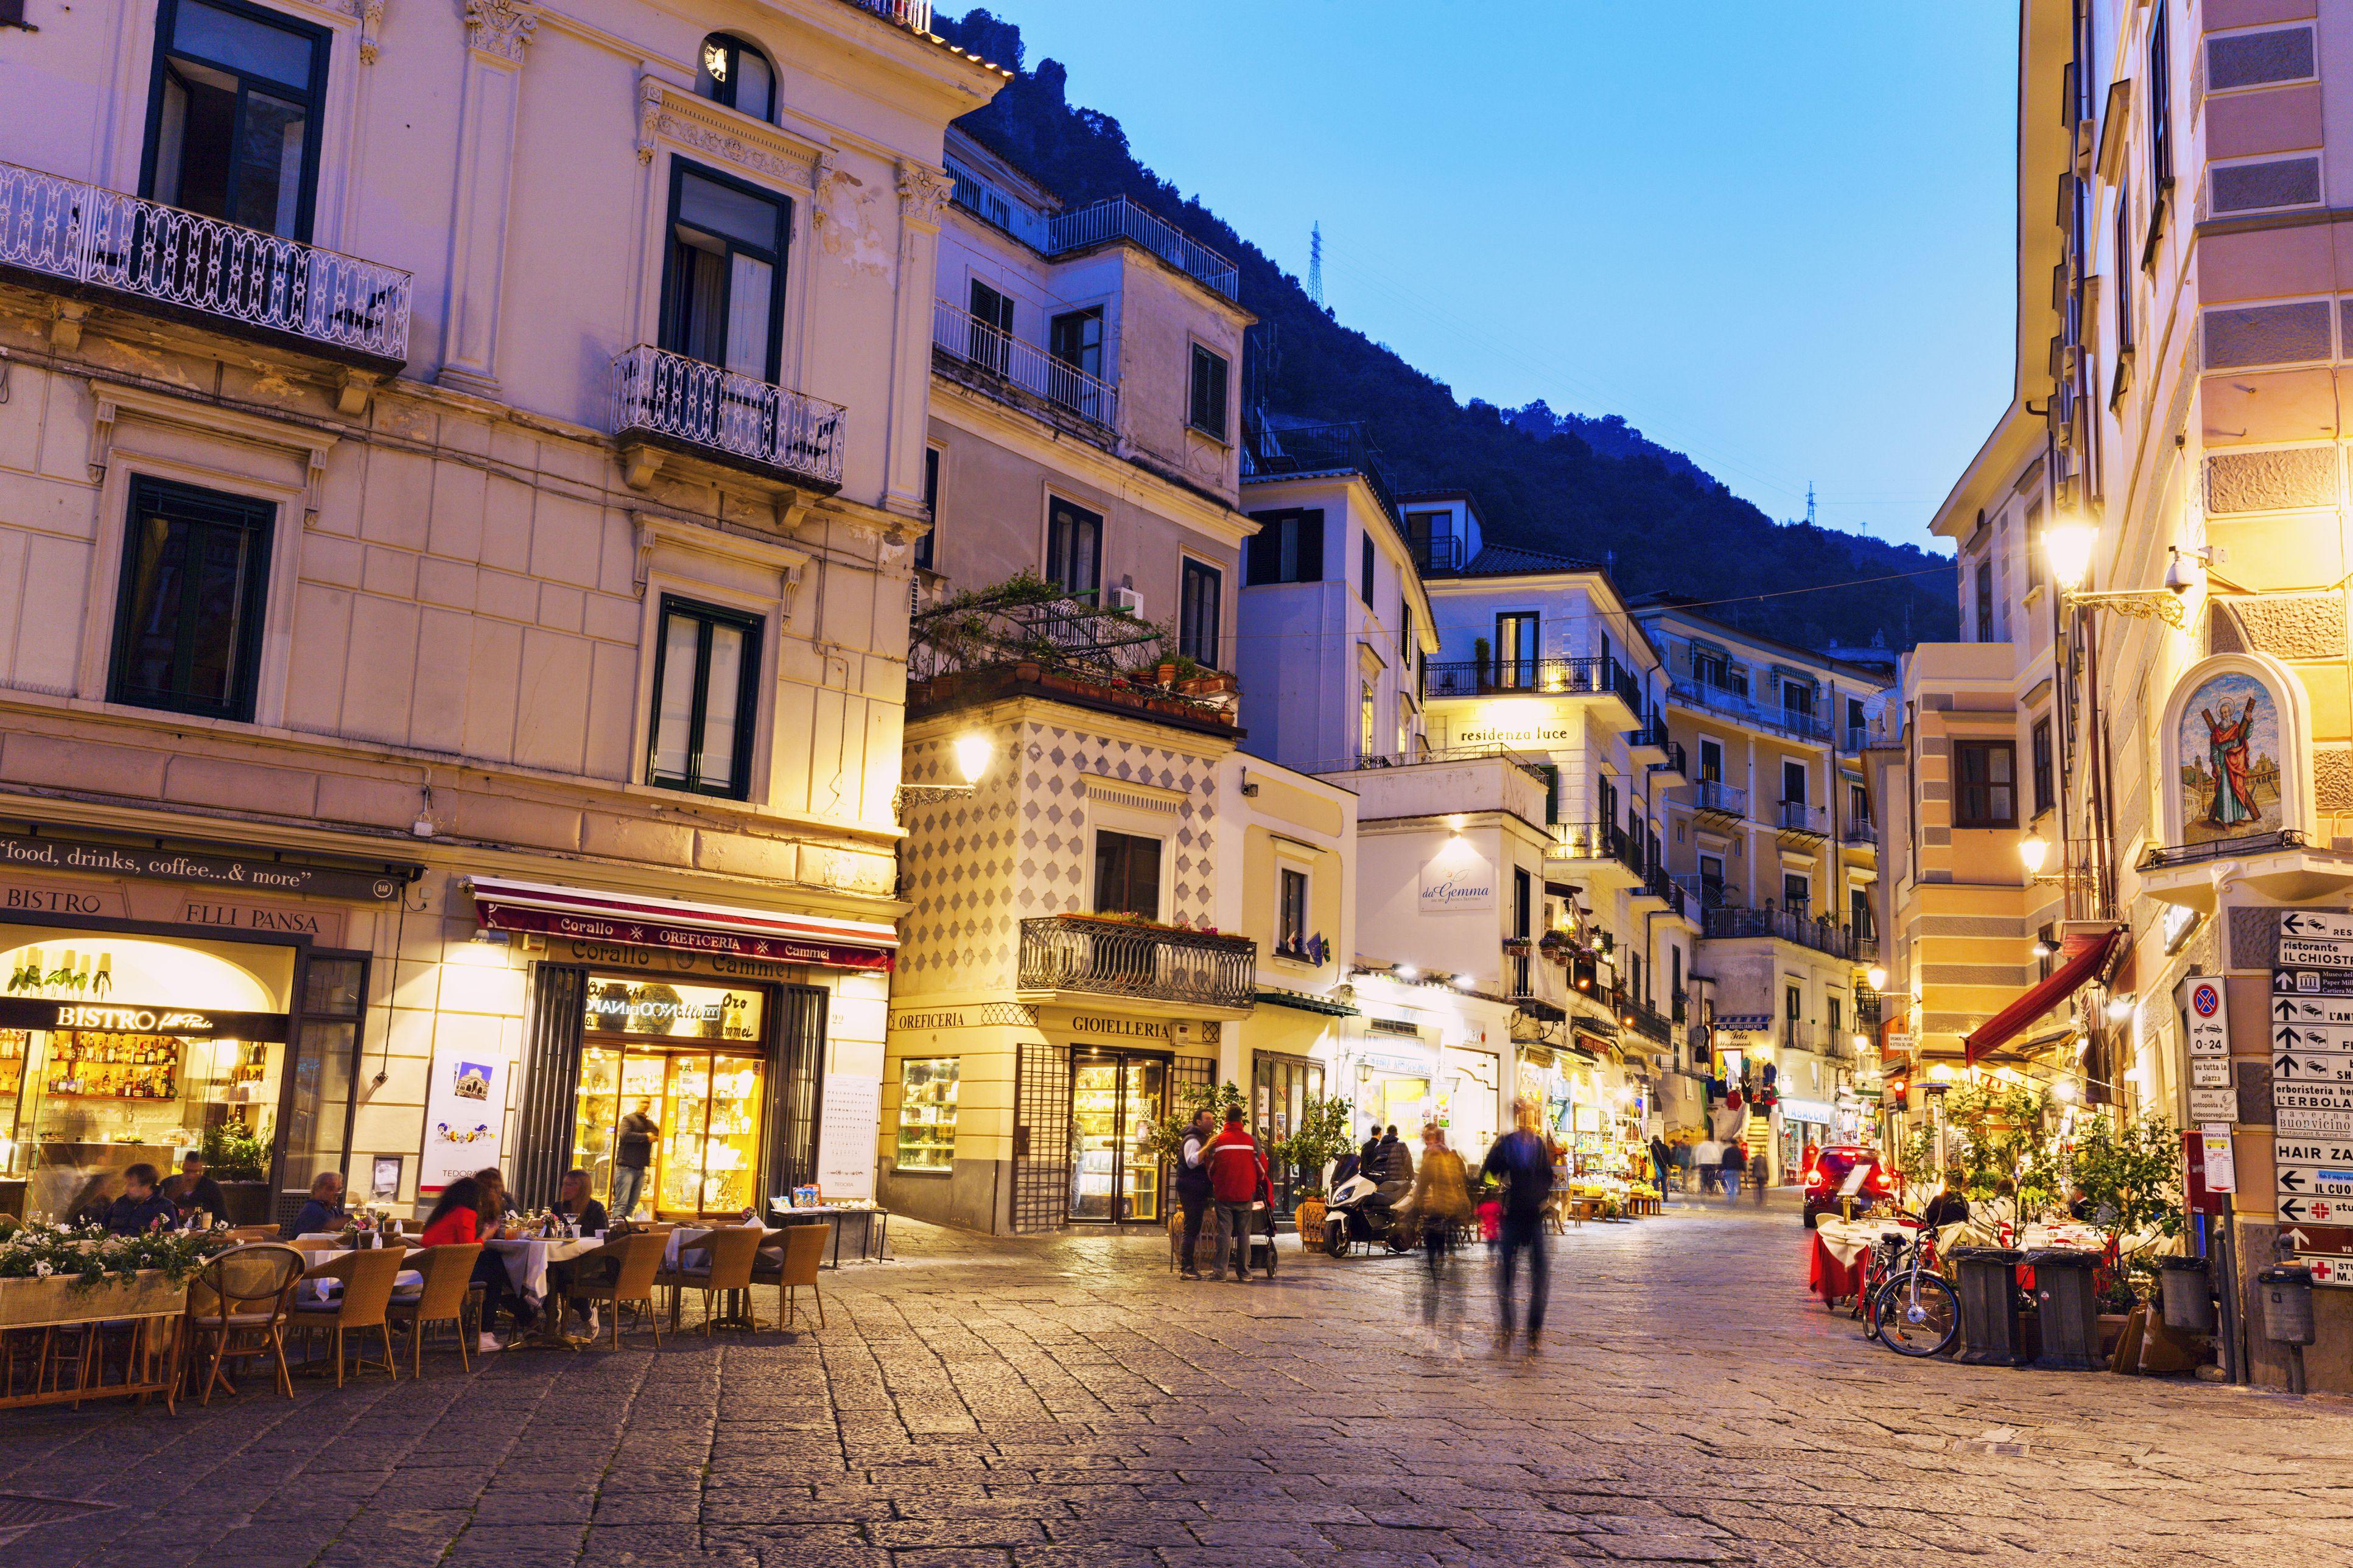 Shopping in Italian Cities